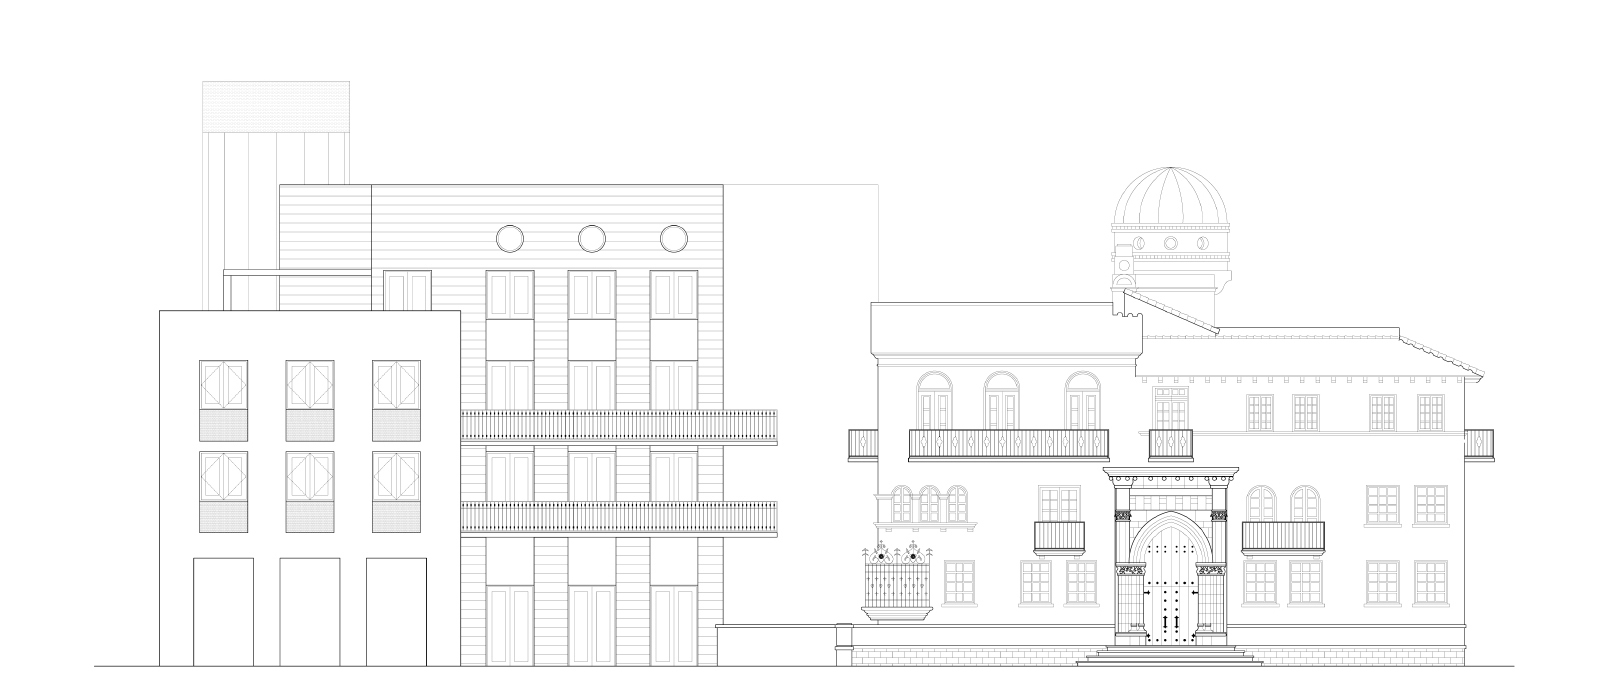 Casa Casuarina Versace Shulman Associates Design Architecture Interior Urban Graphic